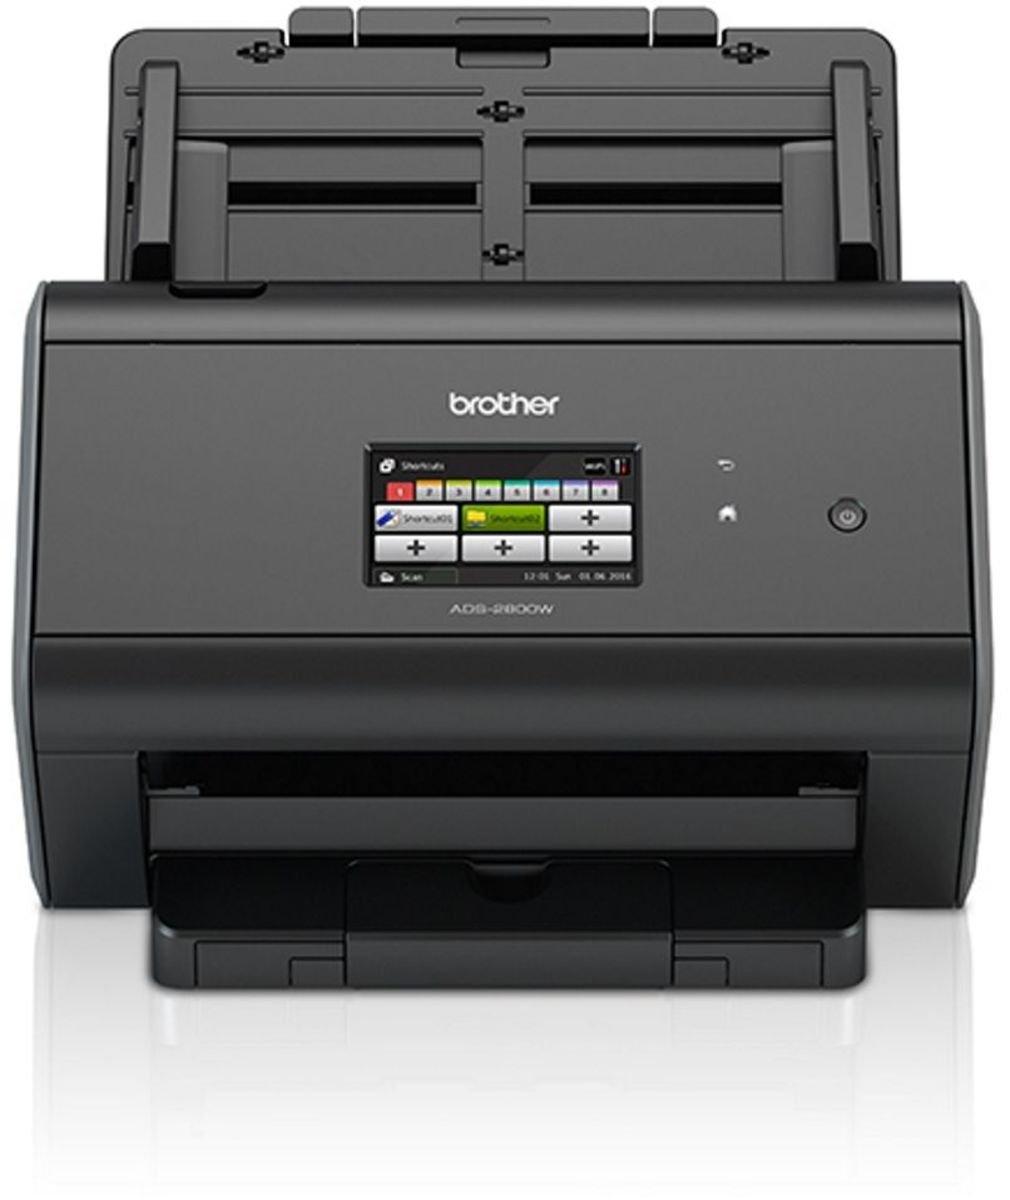 Brother Document scanner »Document scanner ADS-3600W« bij OTTO online kopen